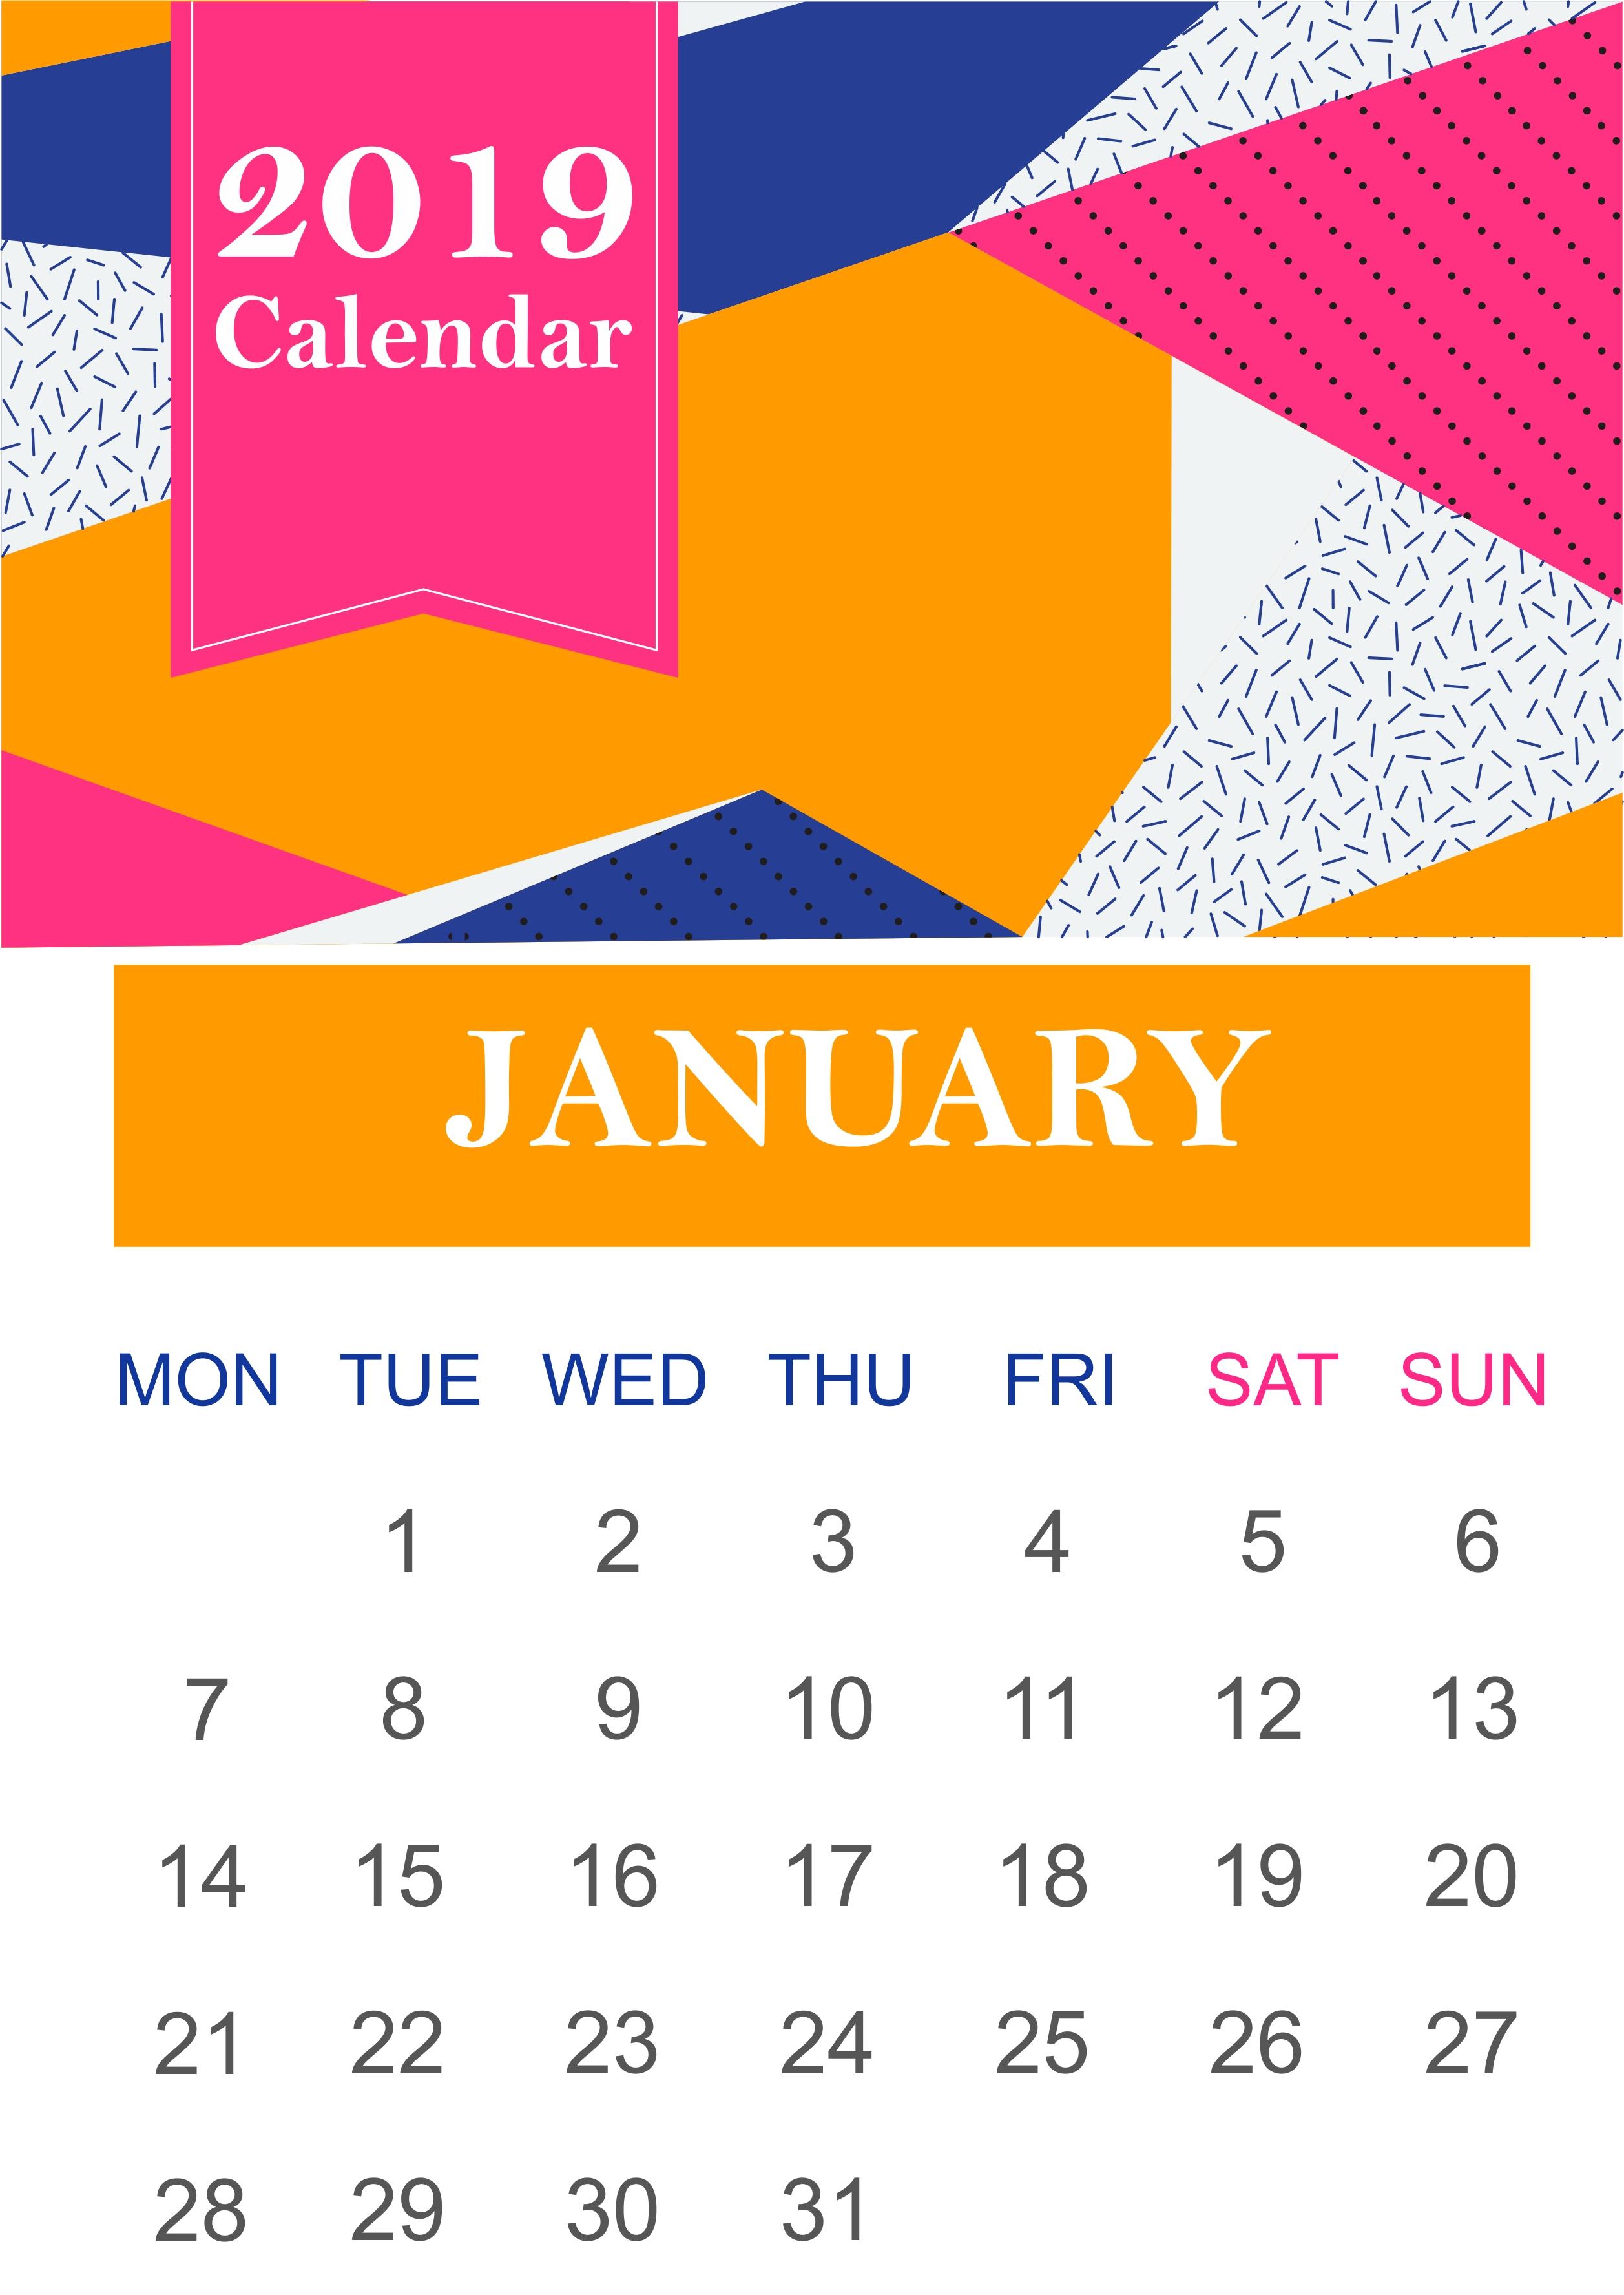 free january 2019 landscape and portrait calendar printable template::January 2019 Calendar Printable Template